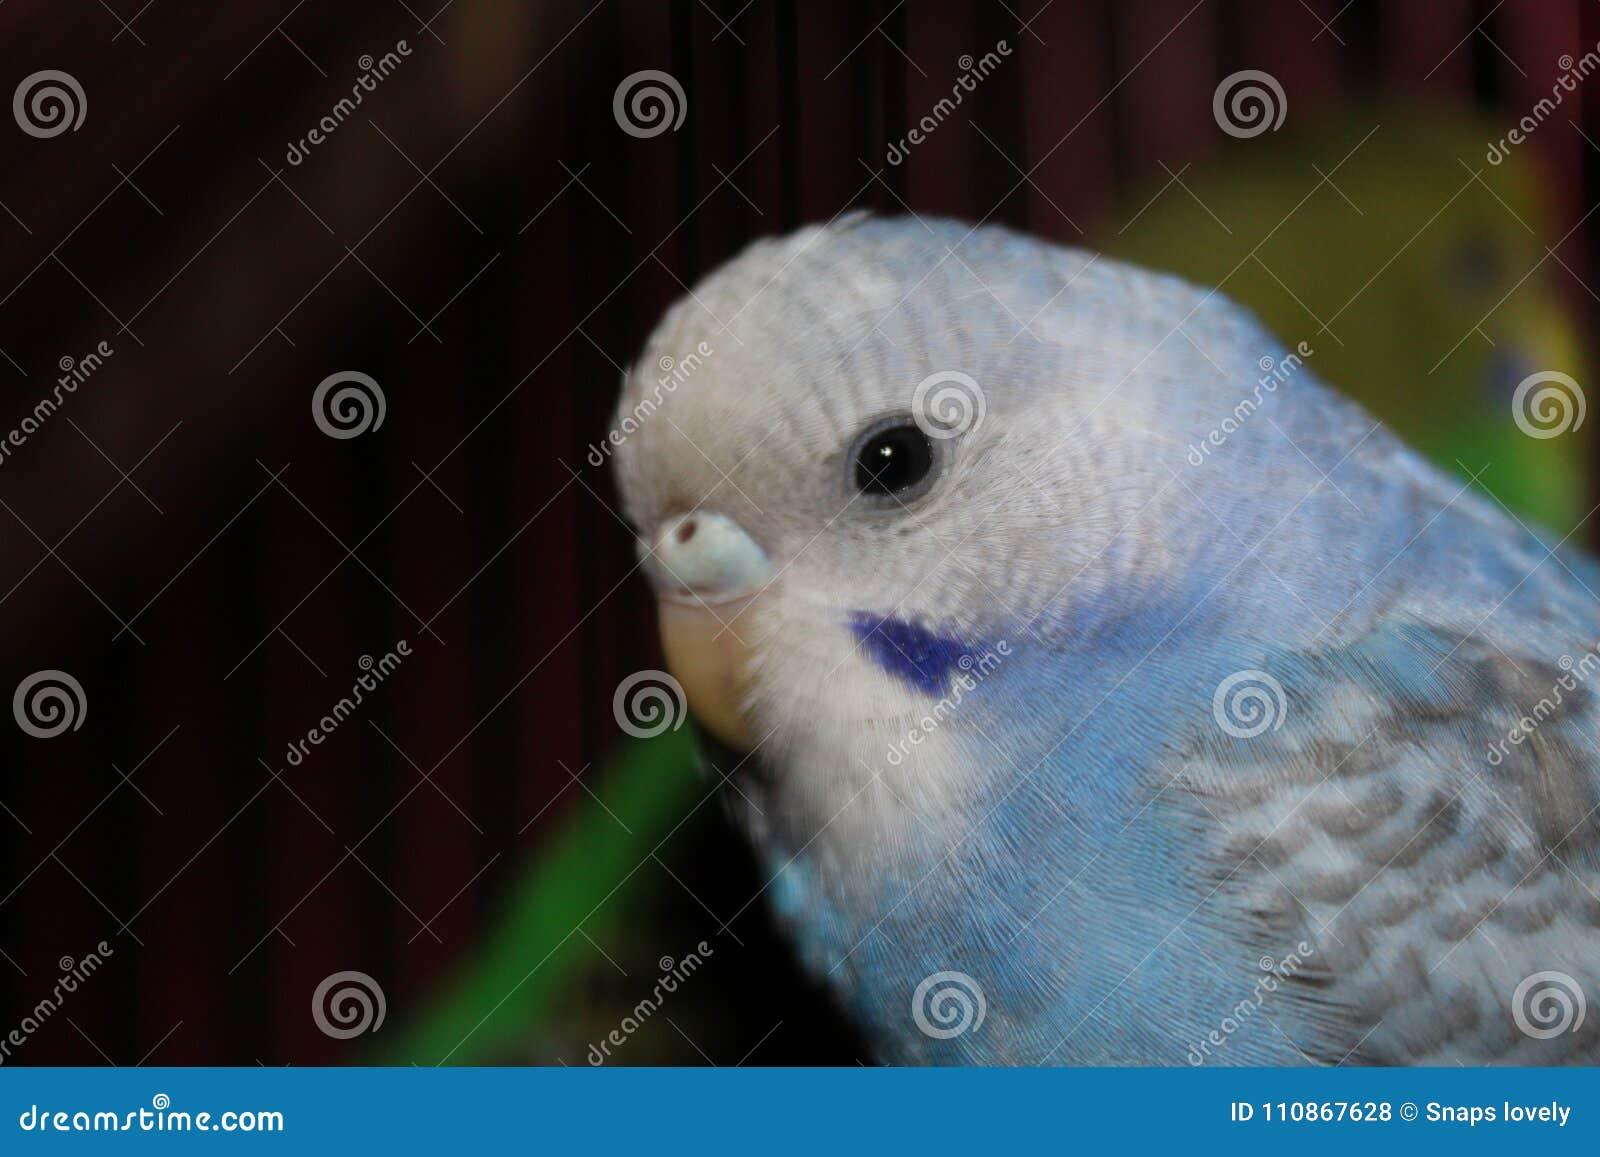 Lovebird Beautiful Blue And White Lovebird Stock Photo Image Of